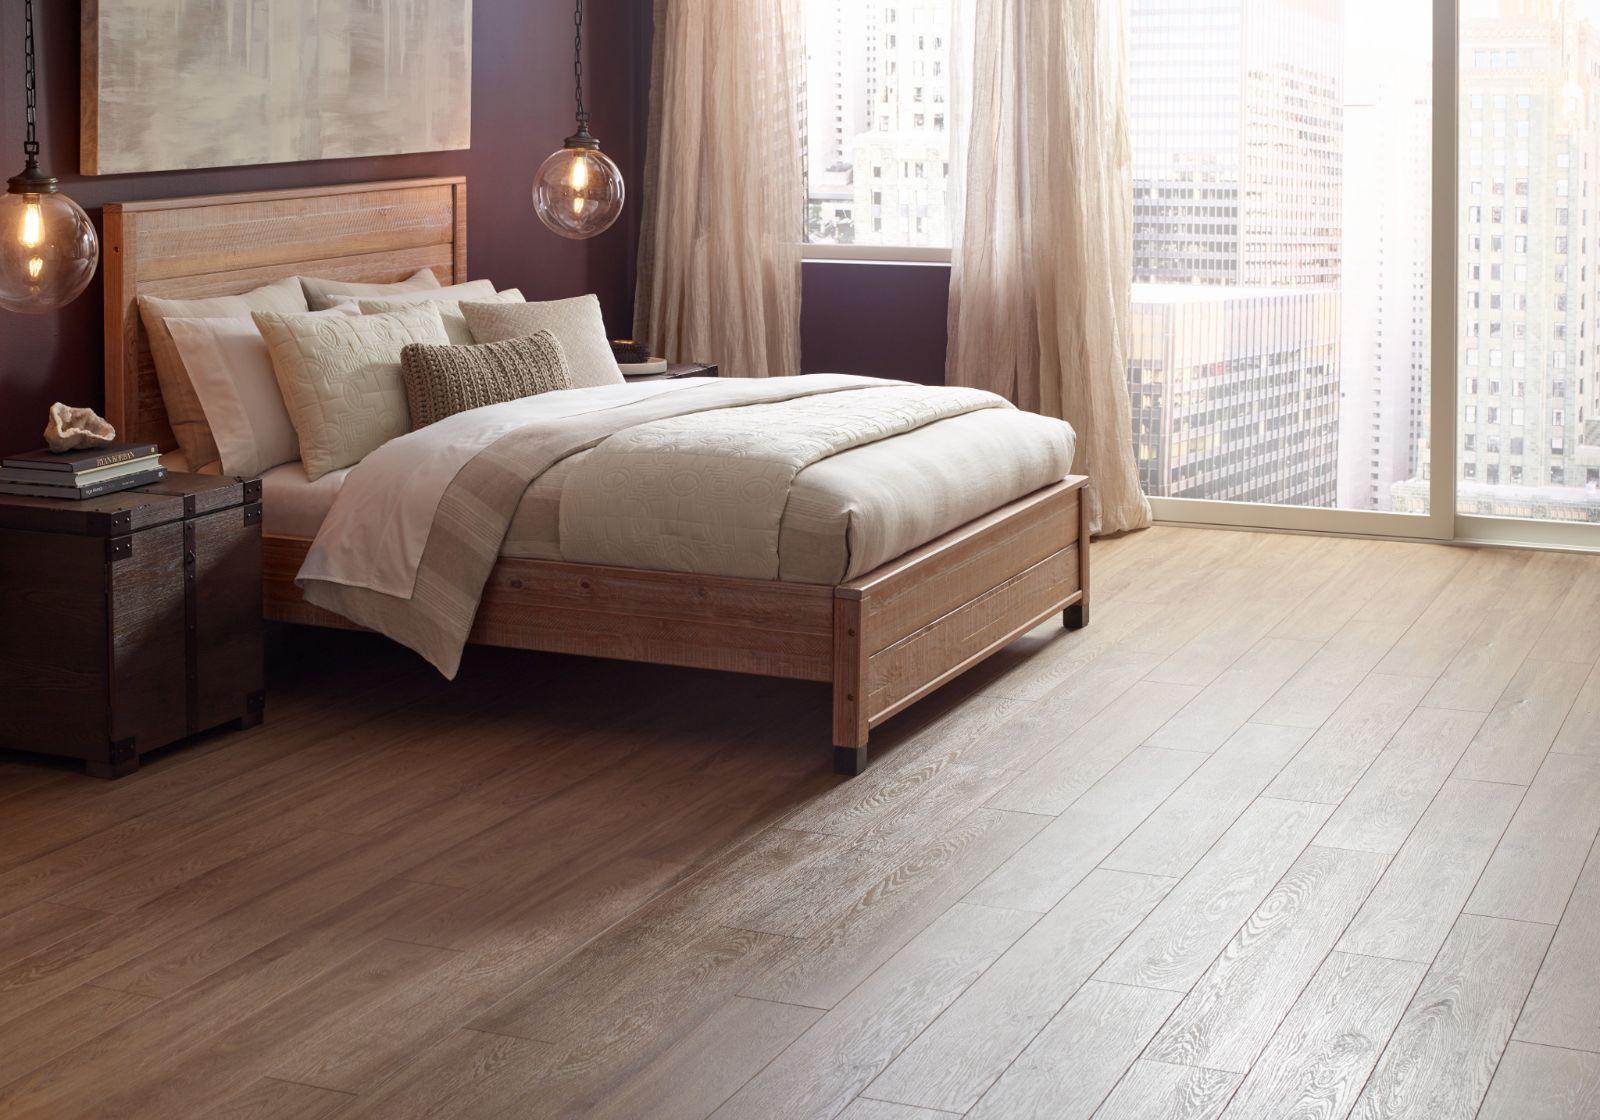 Resilient Vinyl Flooring Vinyl Plank & LVT in 2020